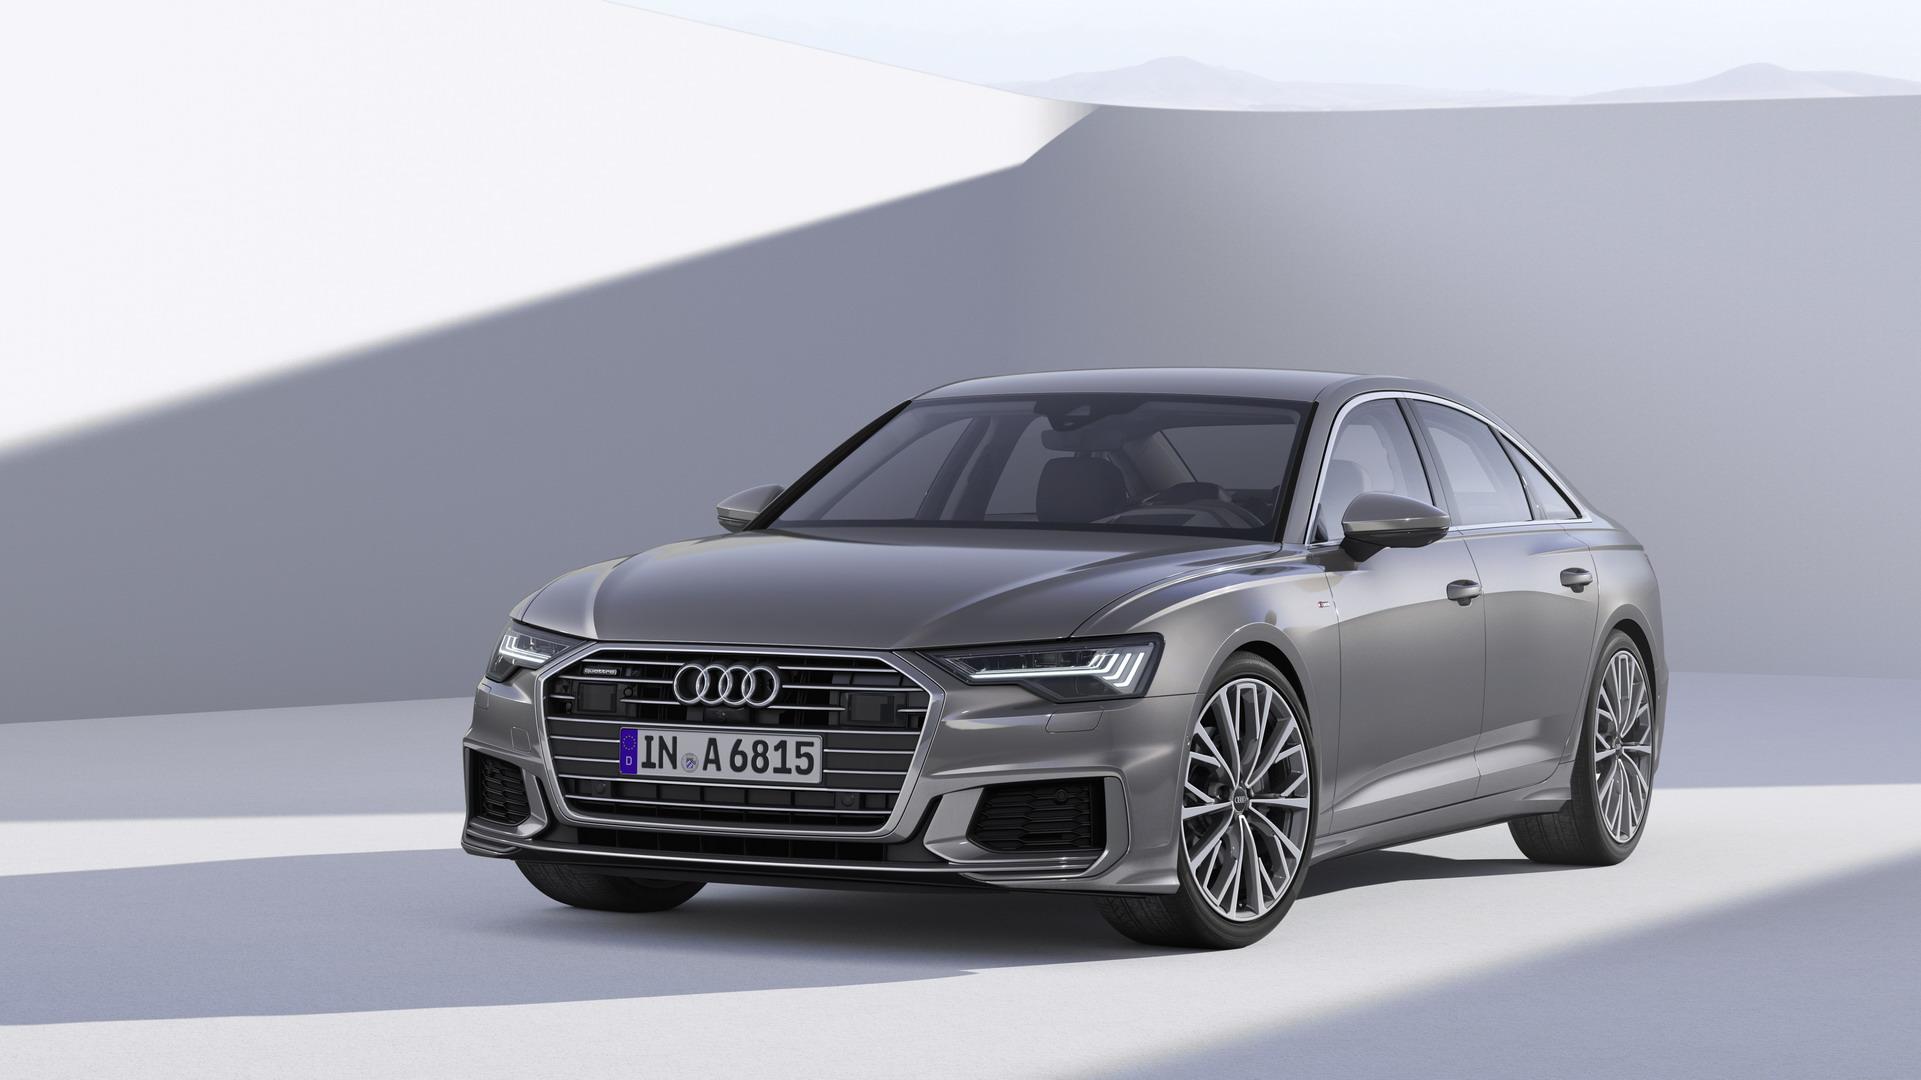 Audi A6 2018 (12)